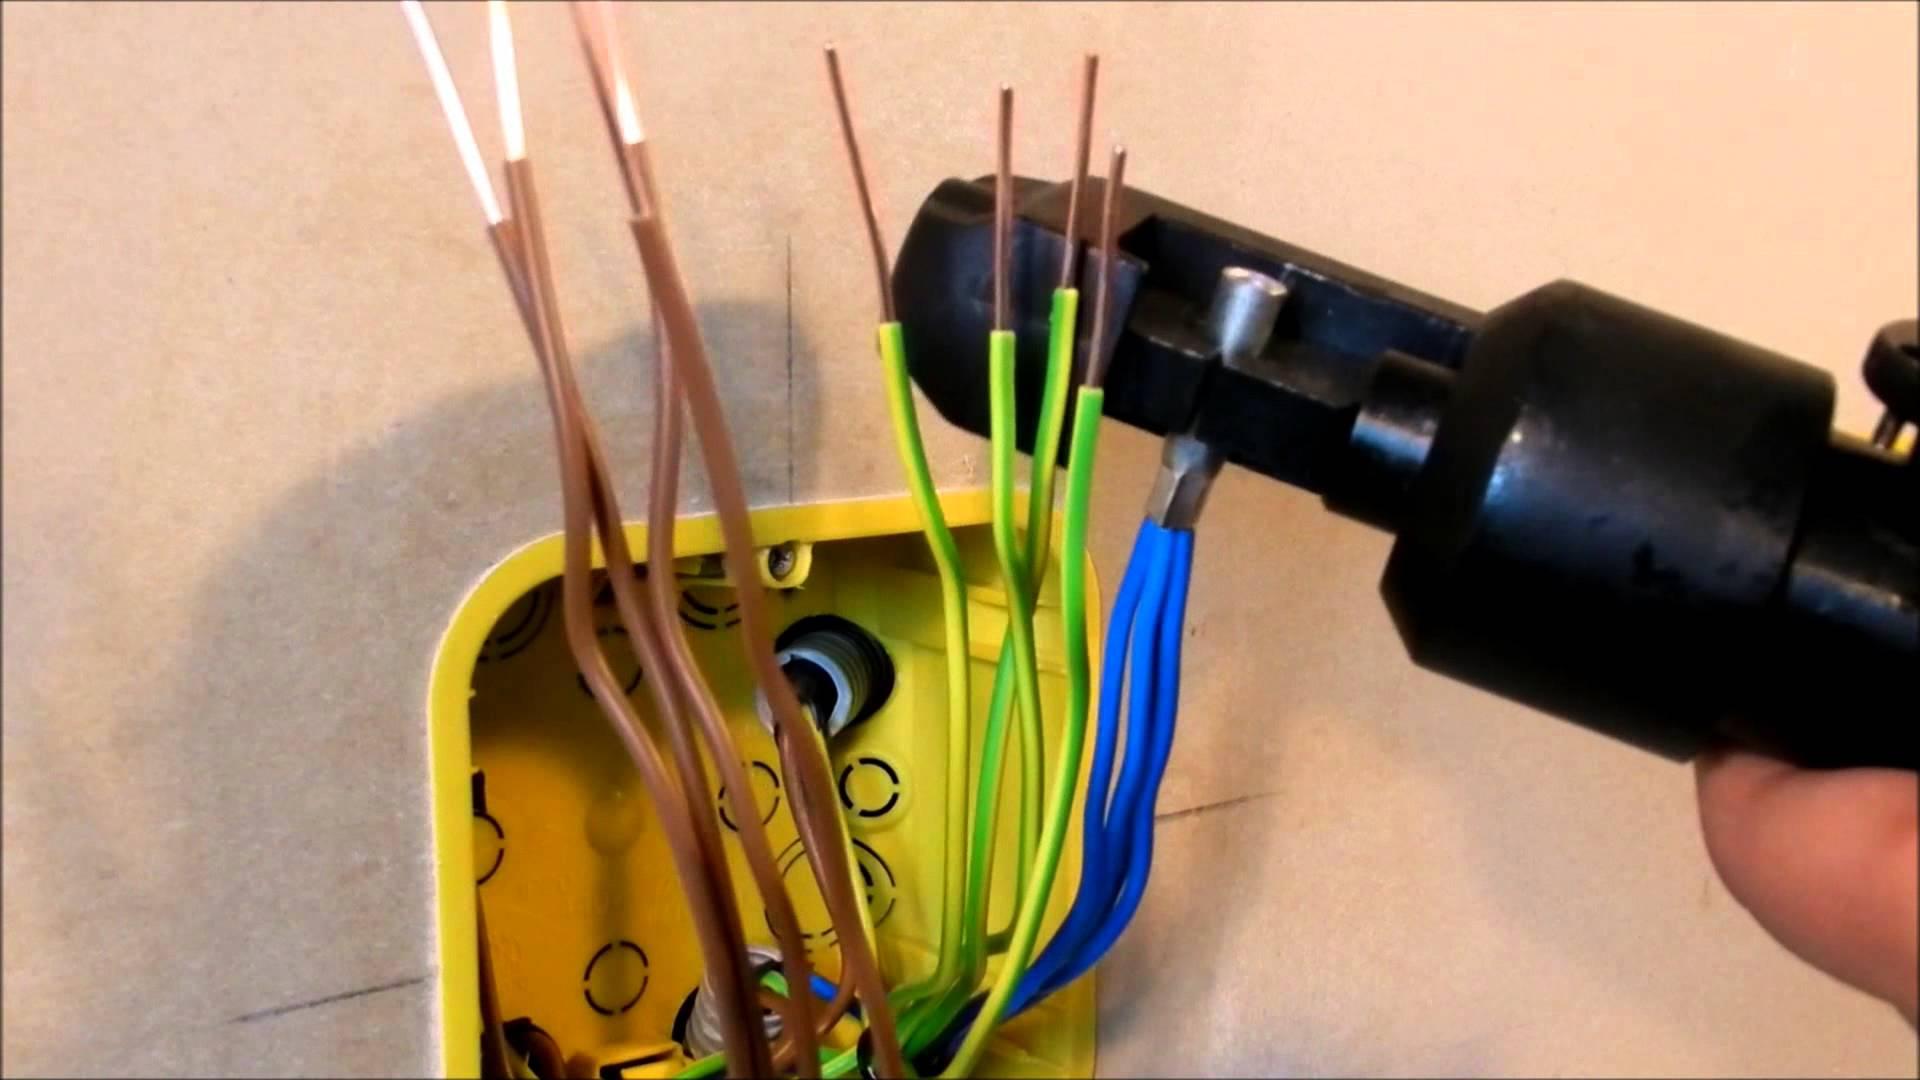 Услуги электрика, электрик выезд на дом, электромонтаж.